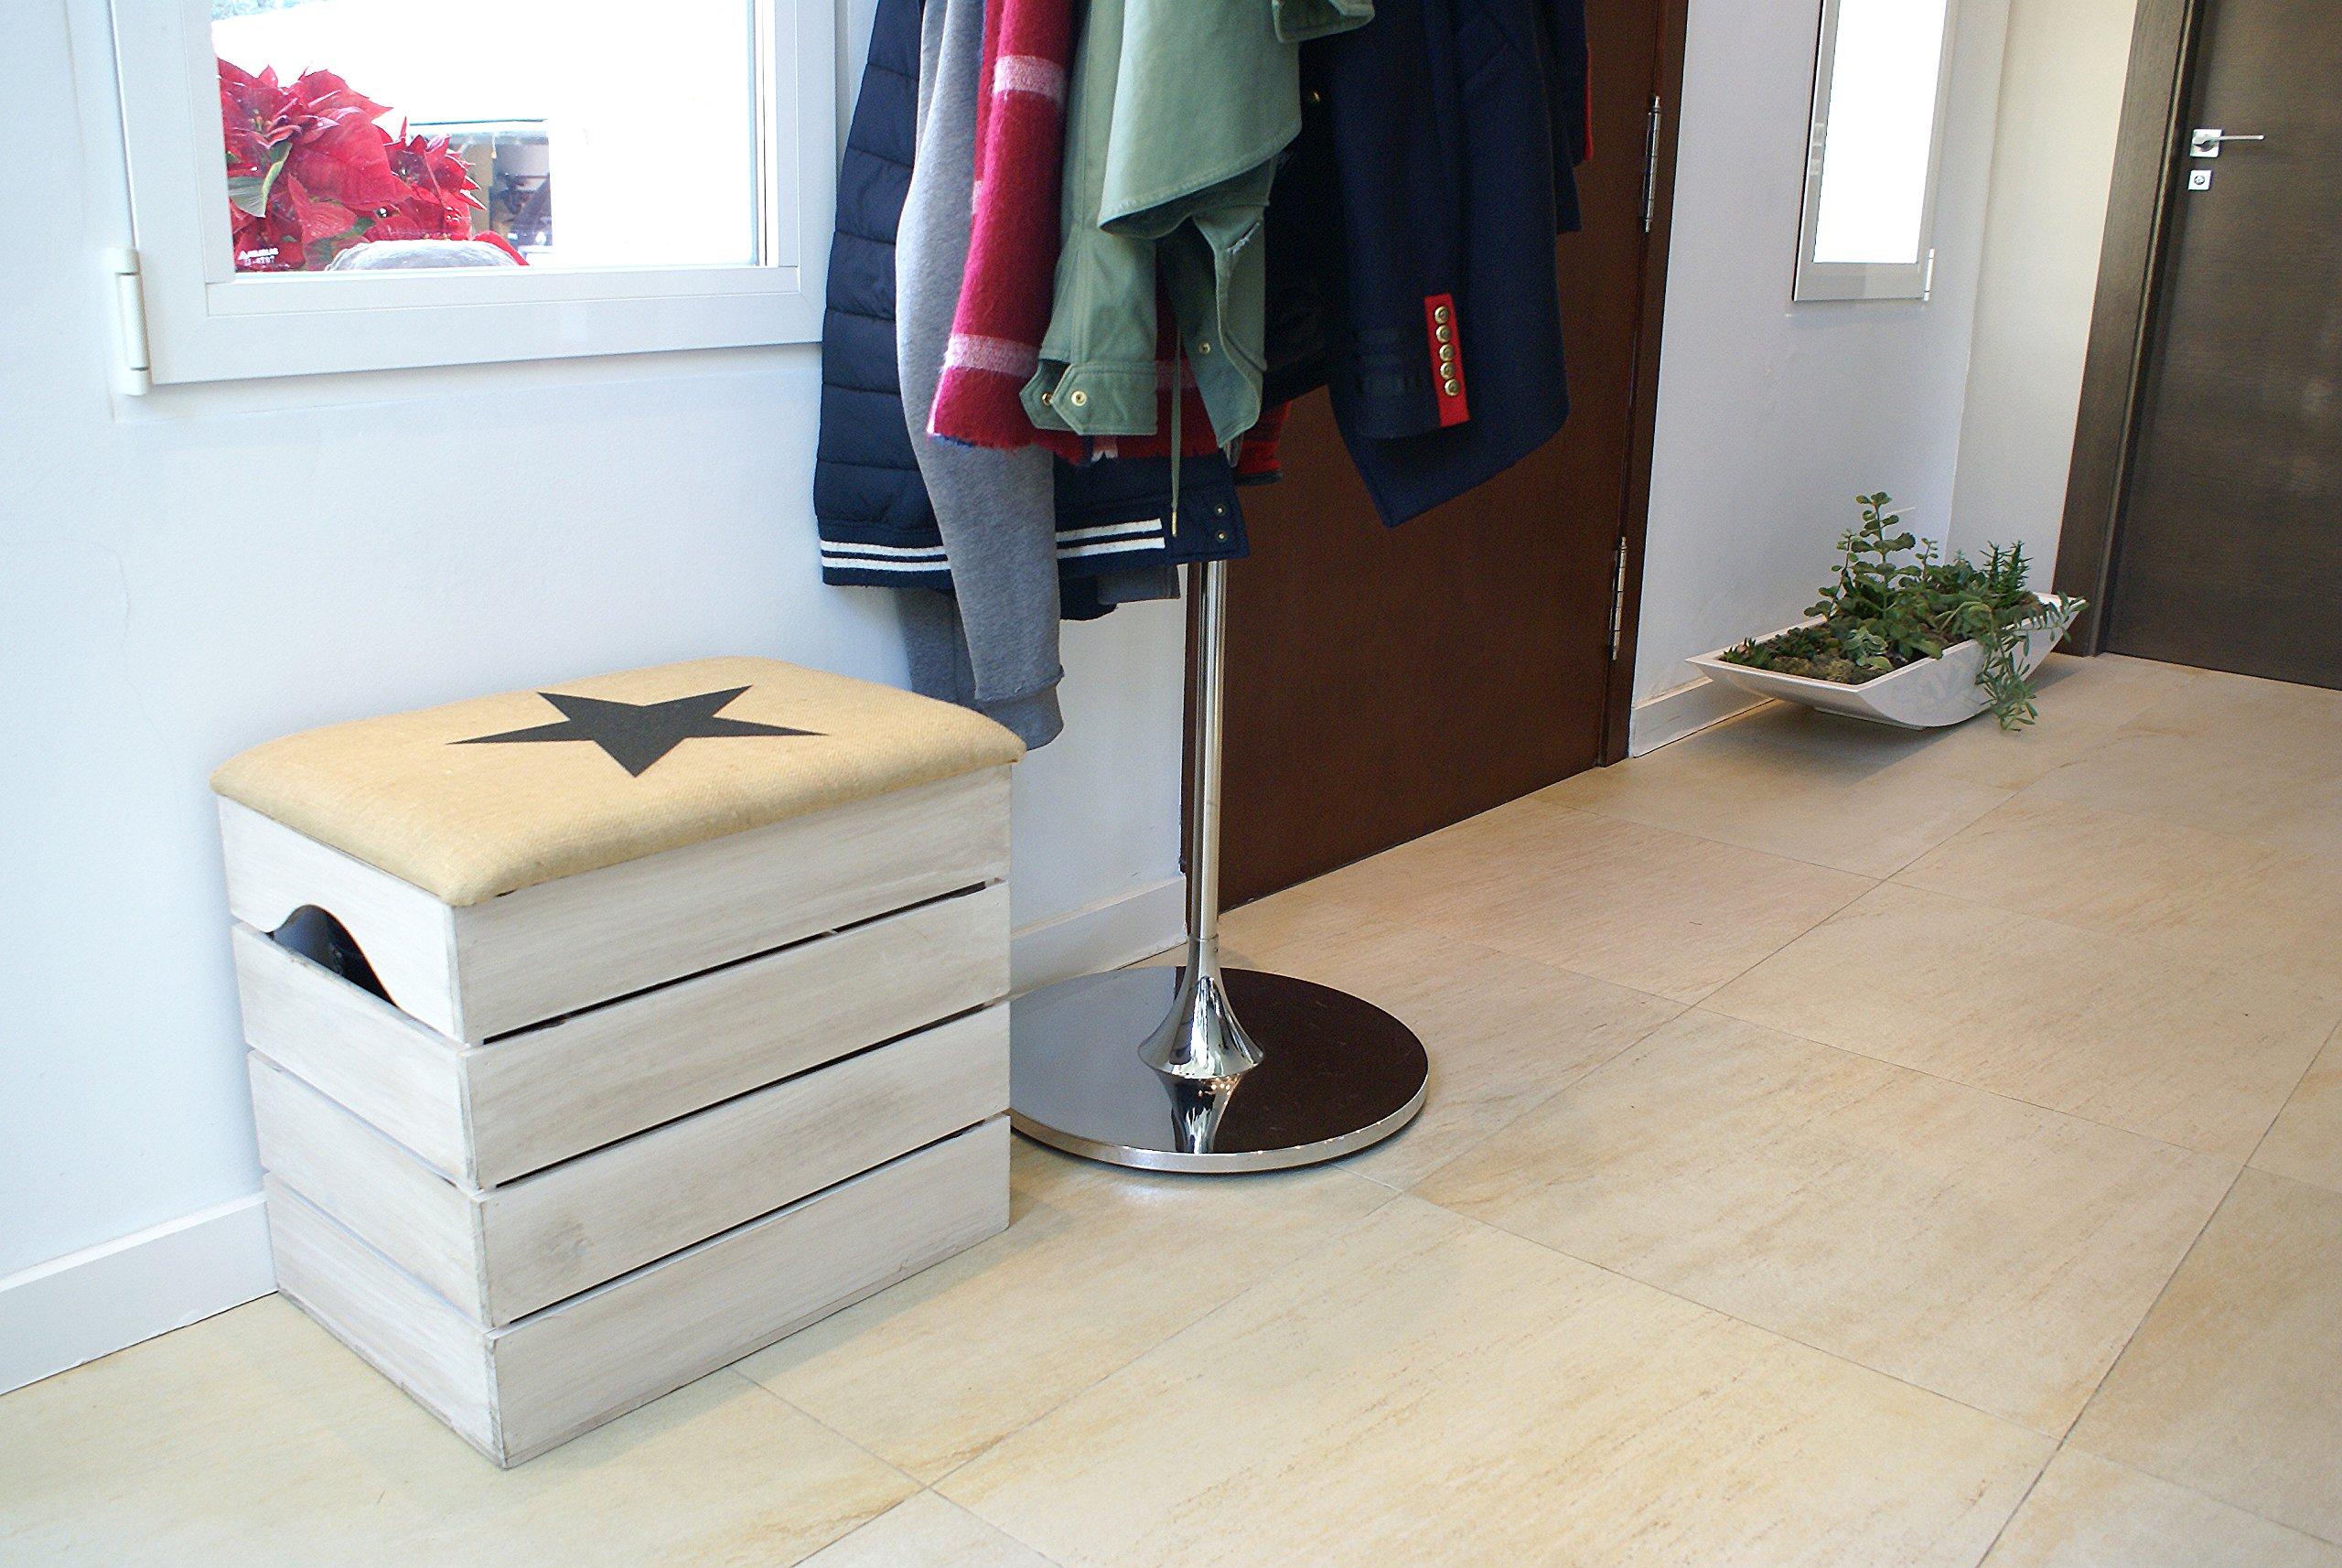 Cassapanca in legno con seduto imbottita ideale per l'ingresso di casa.